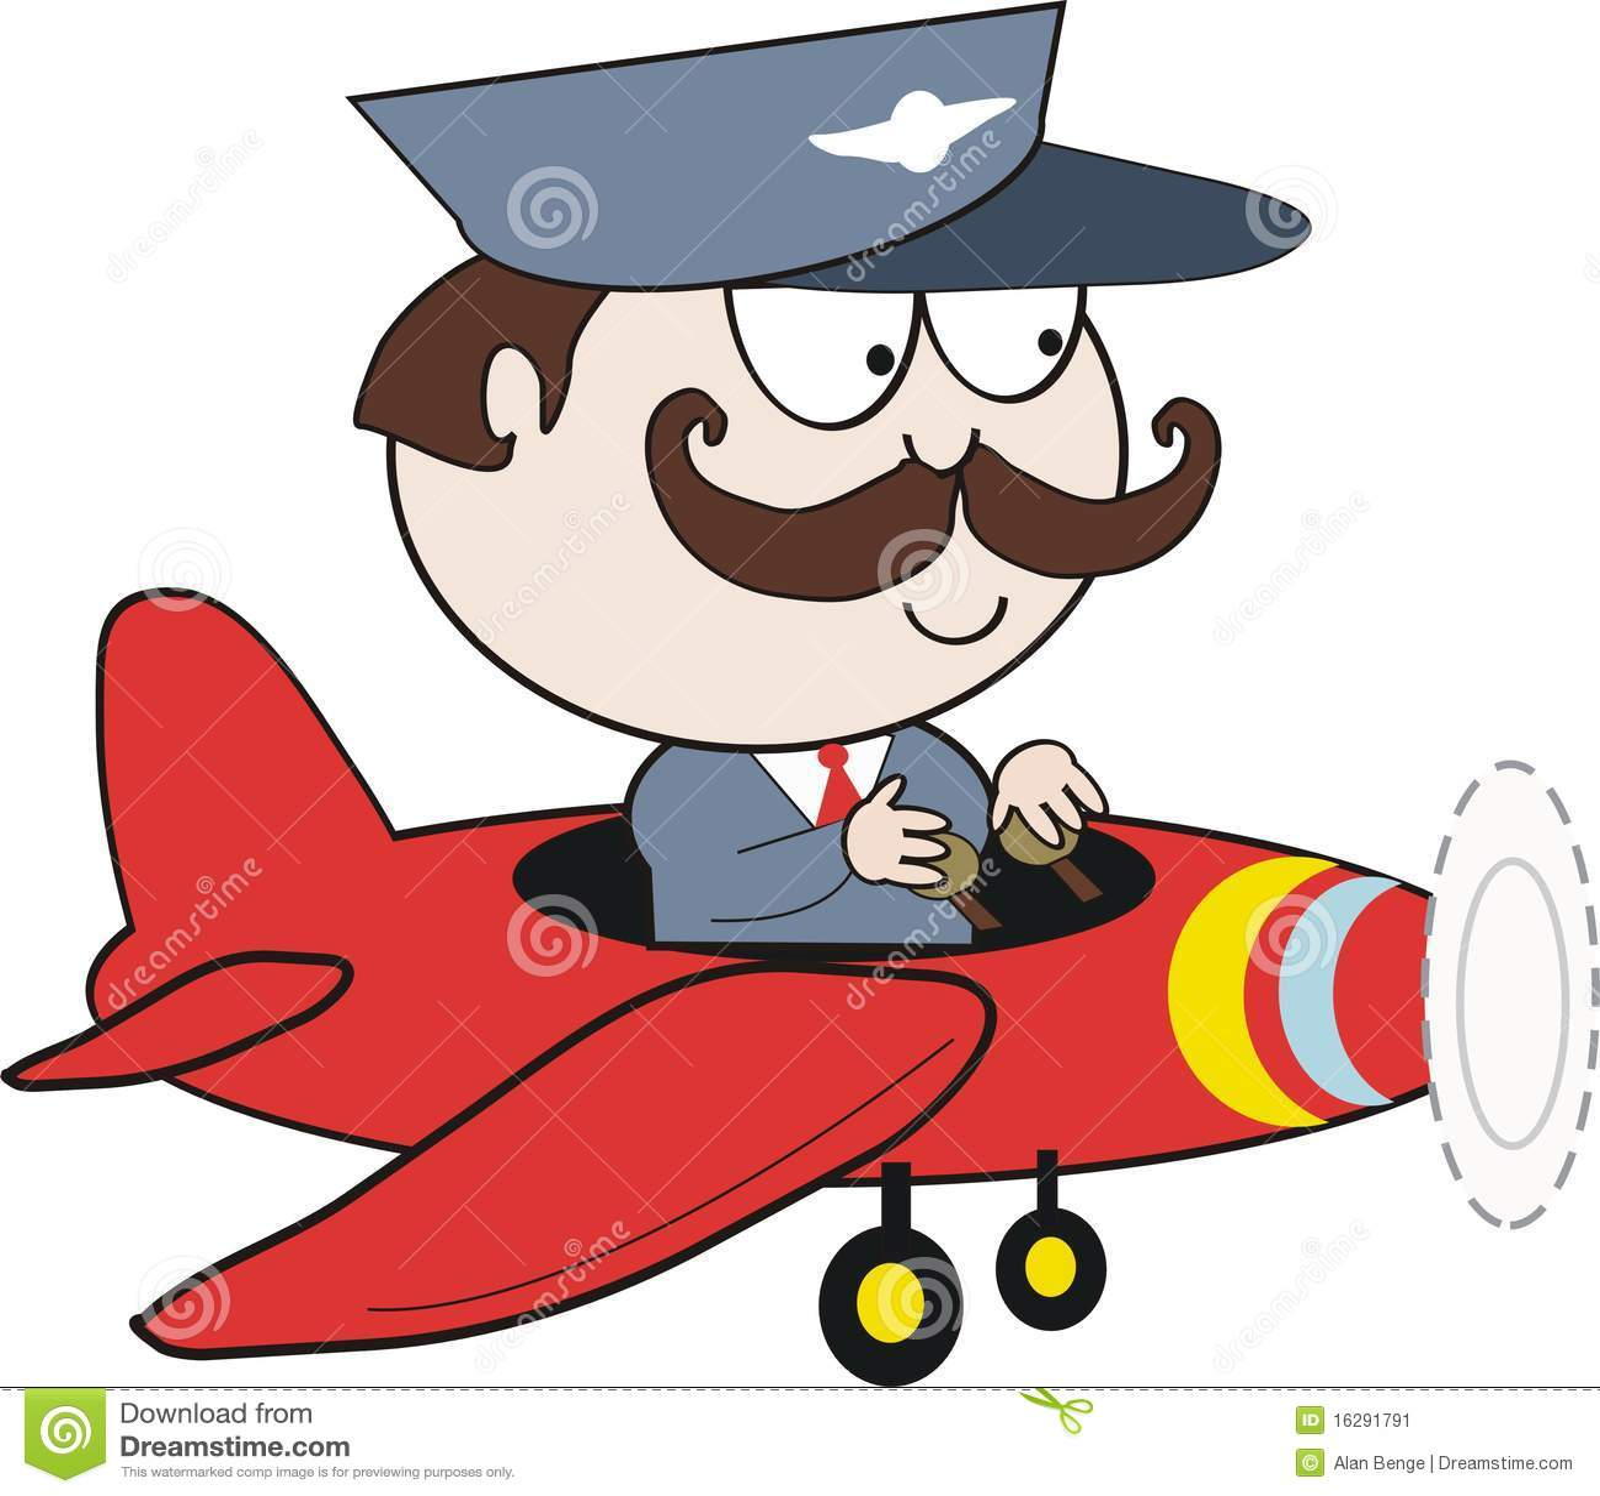 Pilot In Plane Cartoon Stock Image - Image: 16291791